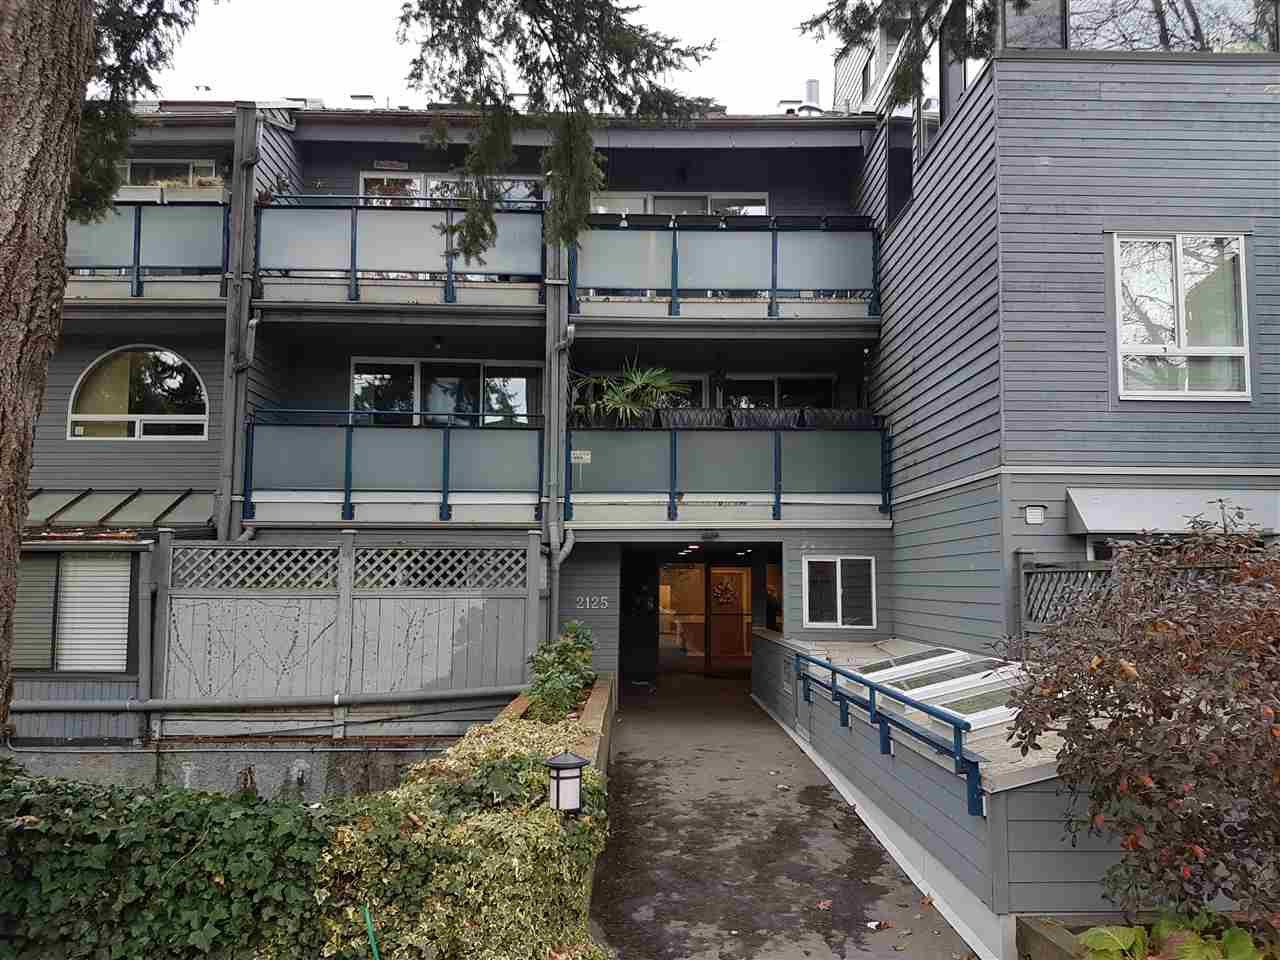 Main Photo: 203 2125 YORK Avenue in Vancouver: Kitsilano Condo for sale (Vancouver West)  : MLS®# R2253317